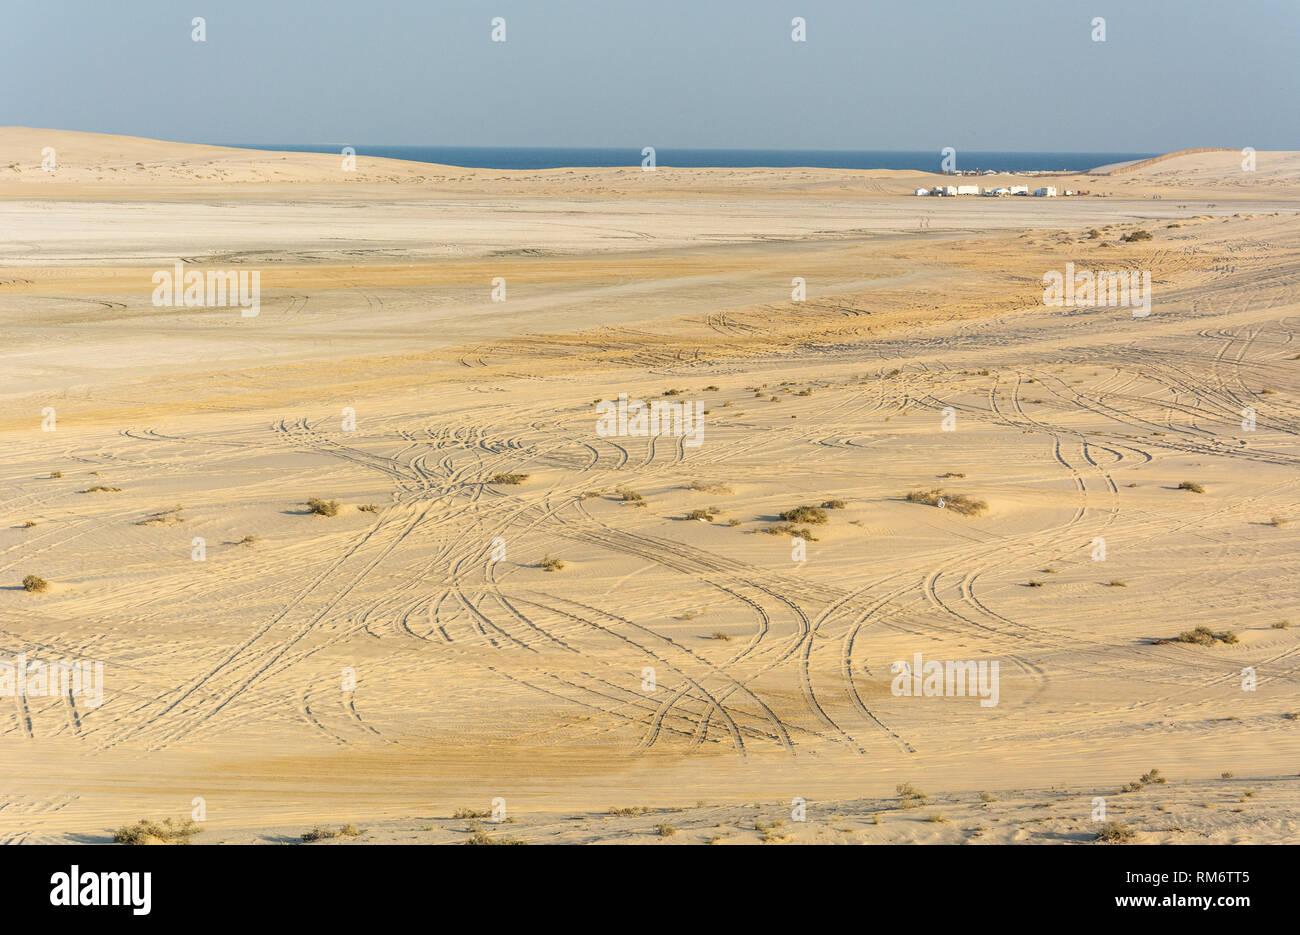 Landscape in Khor Al Adaid desert in Qatar. - Stock Image